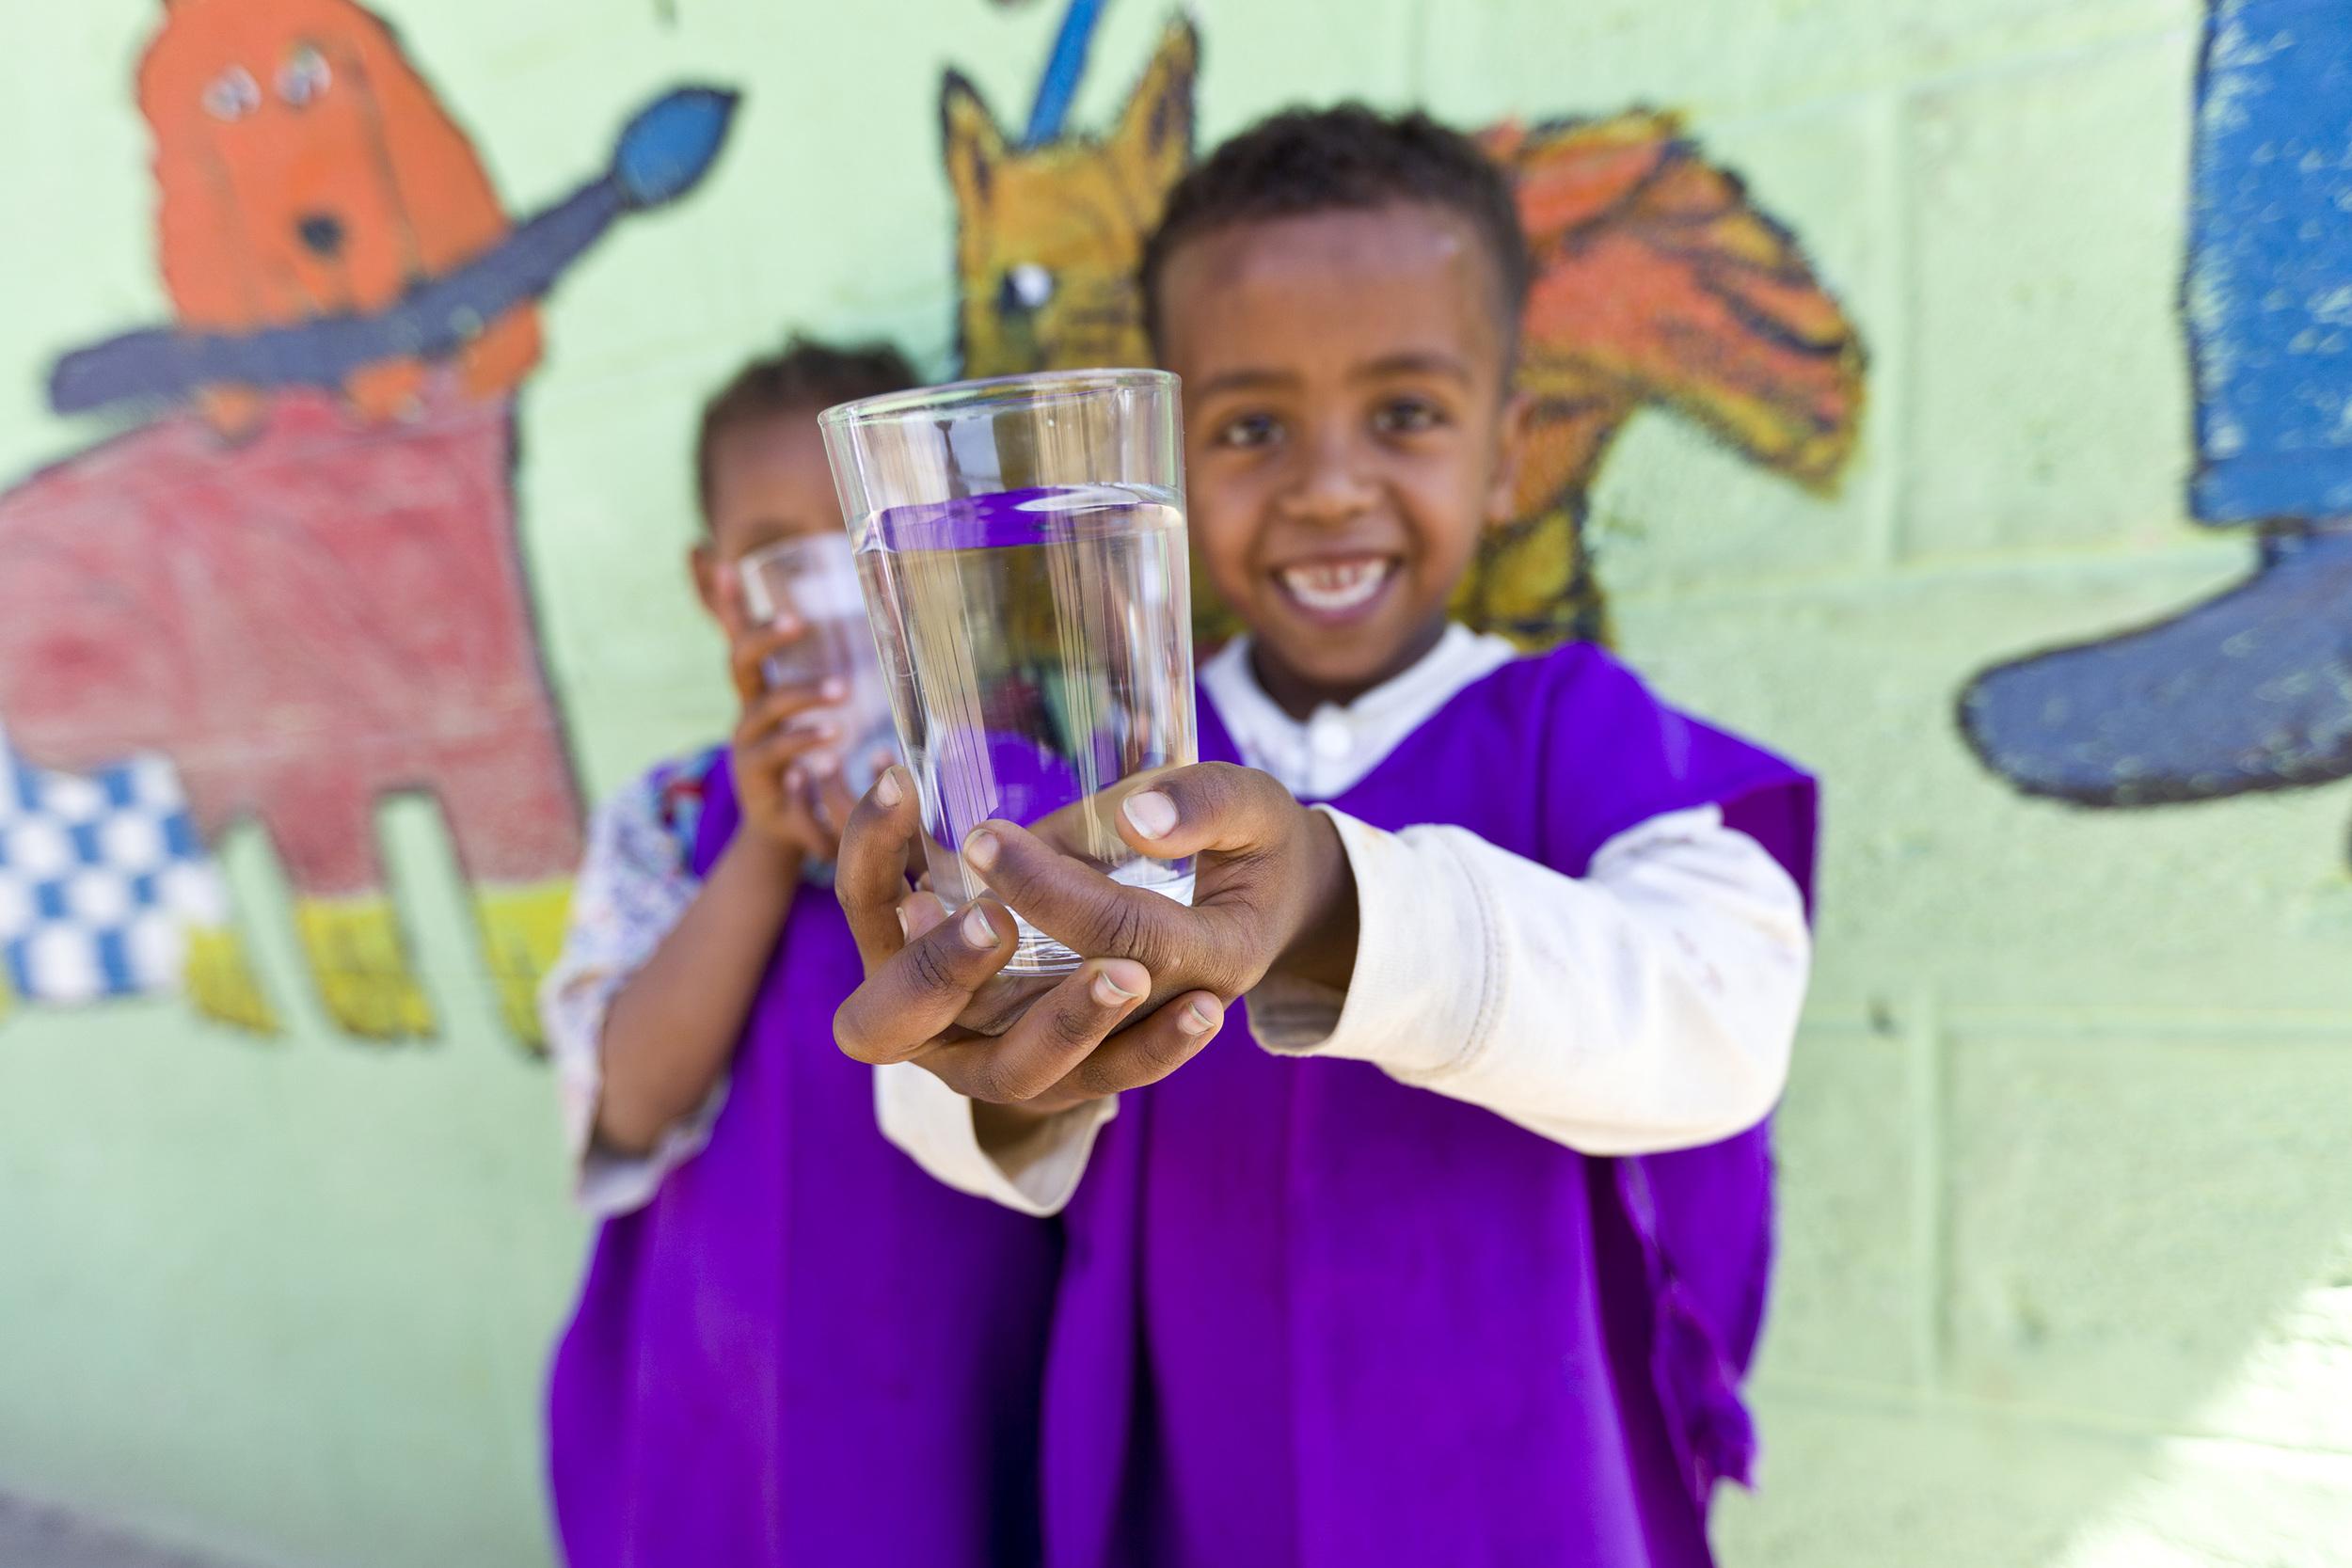 children in an orphanage enjoying filtered drinking water, splash